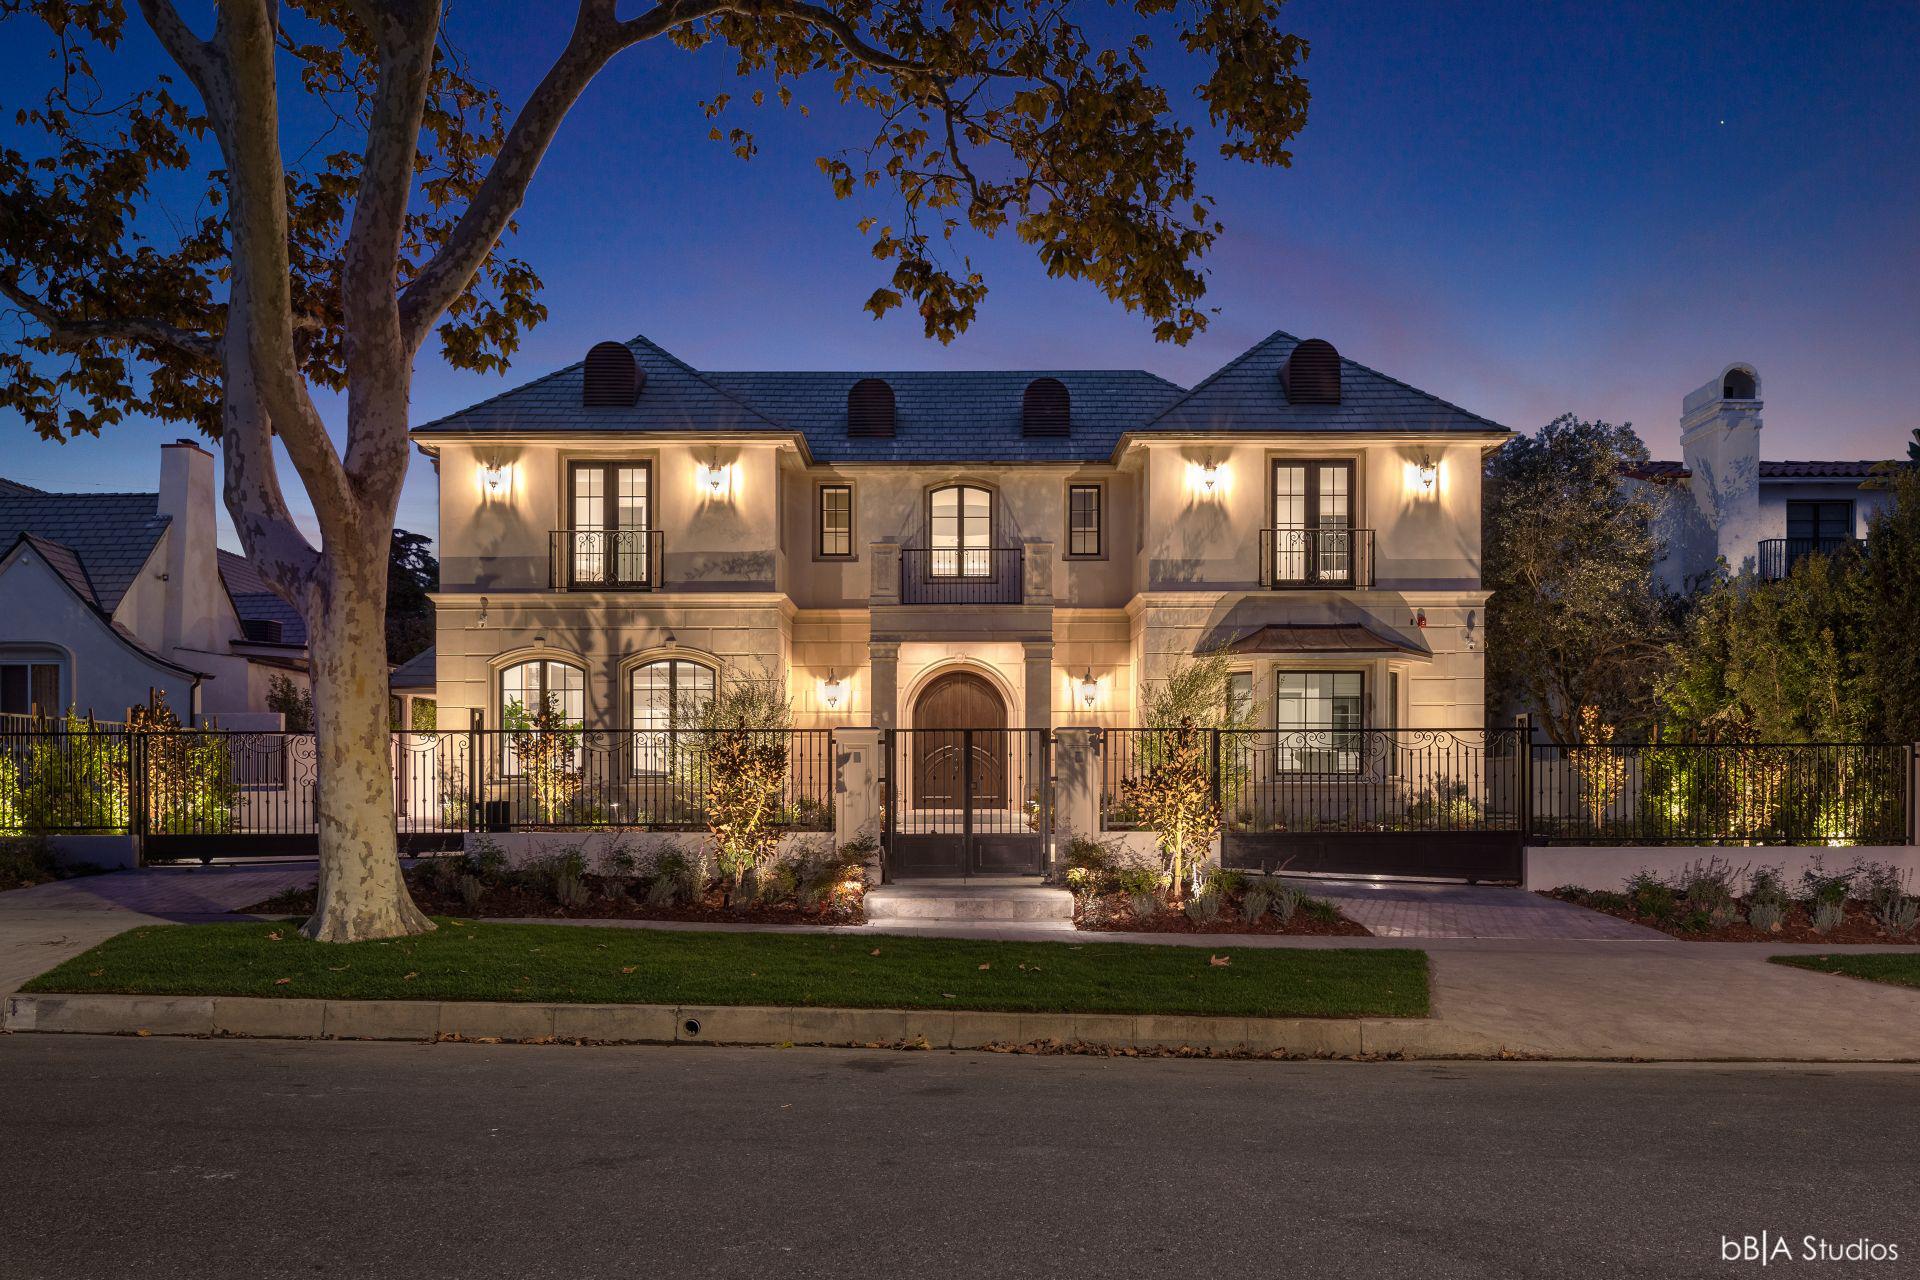 Exterior Classic Home Architecture